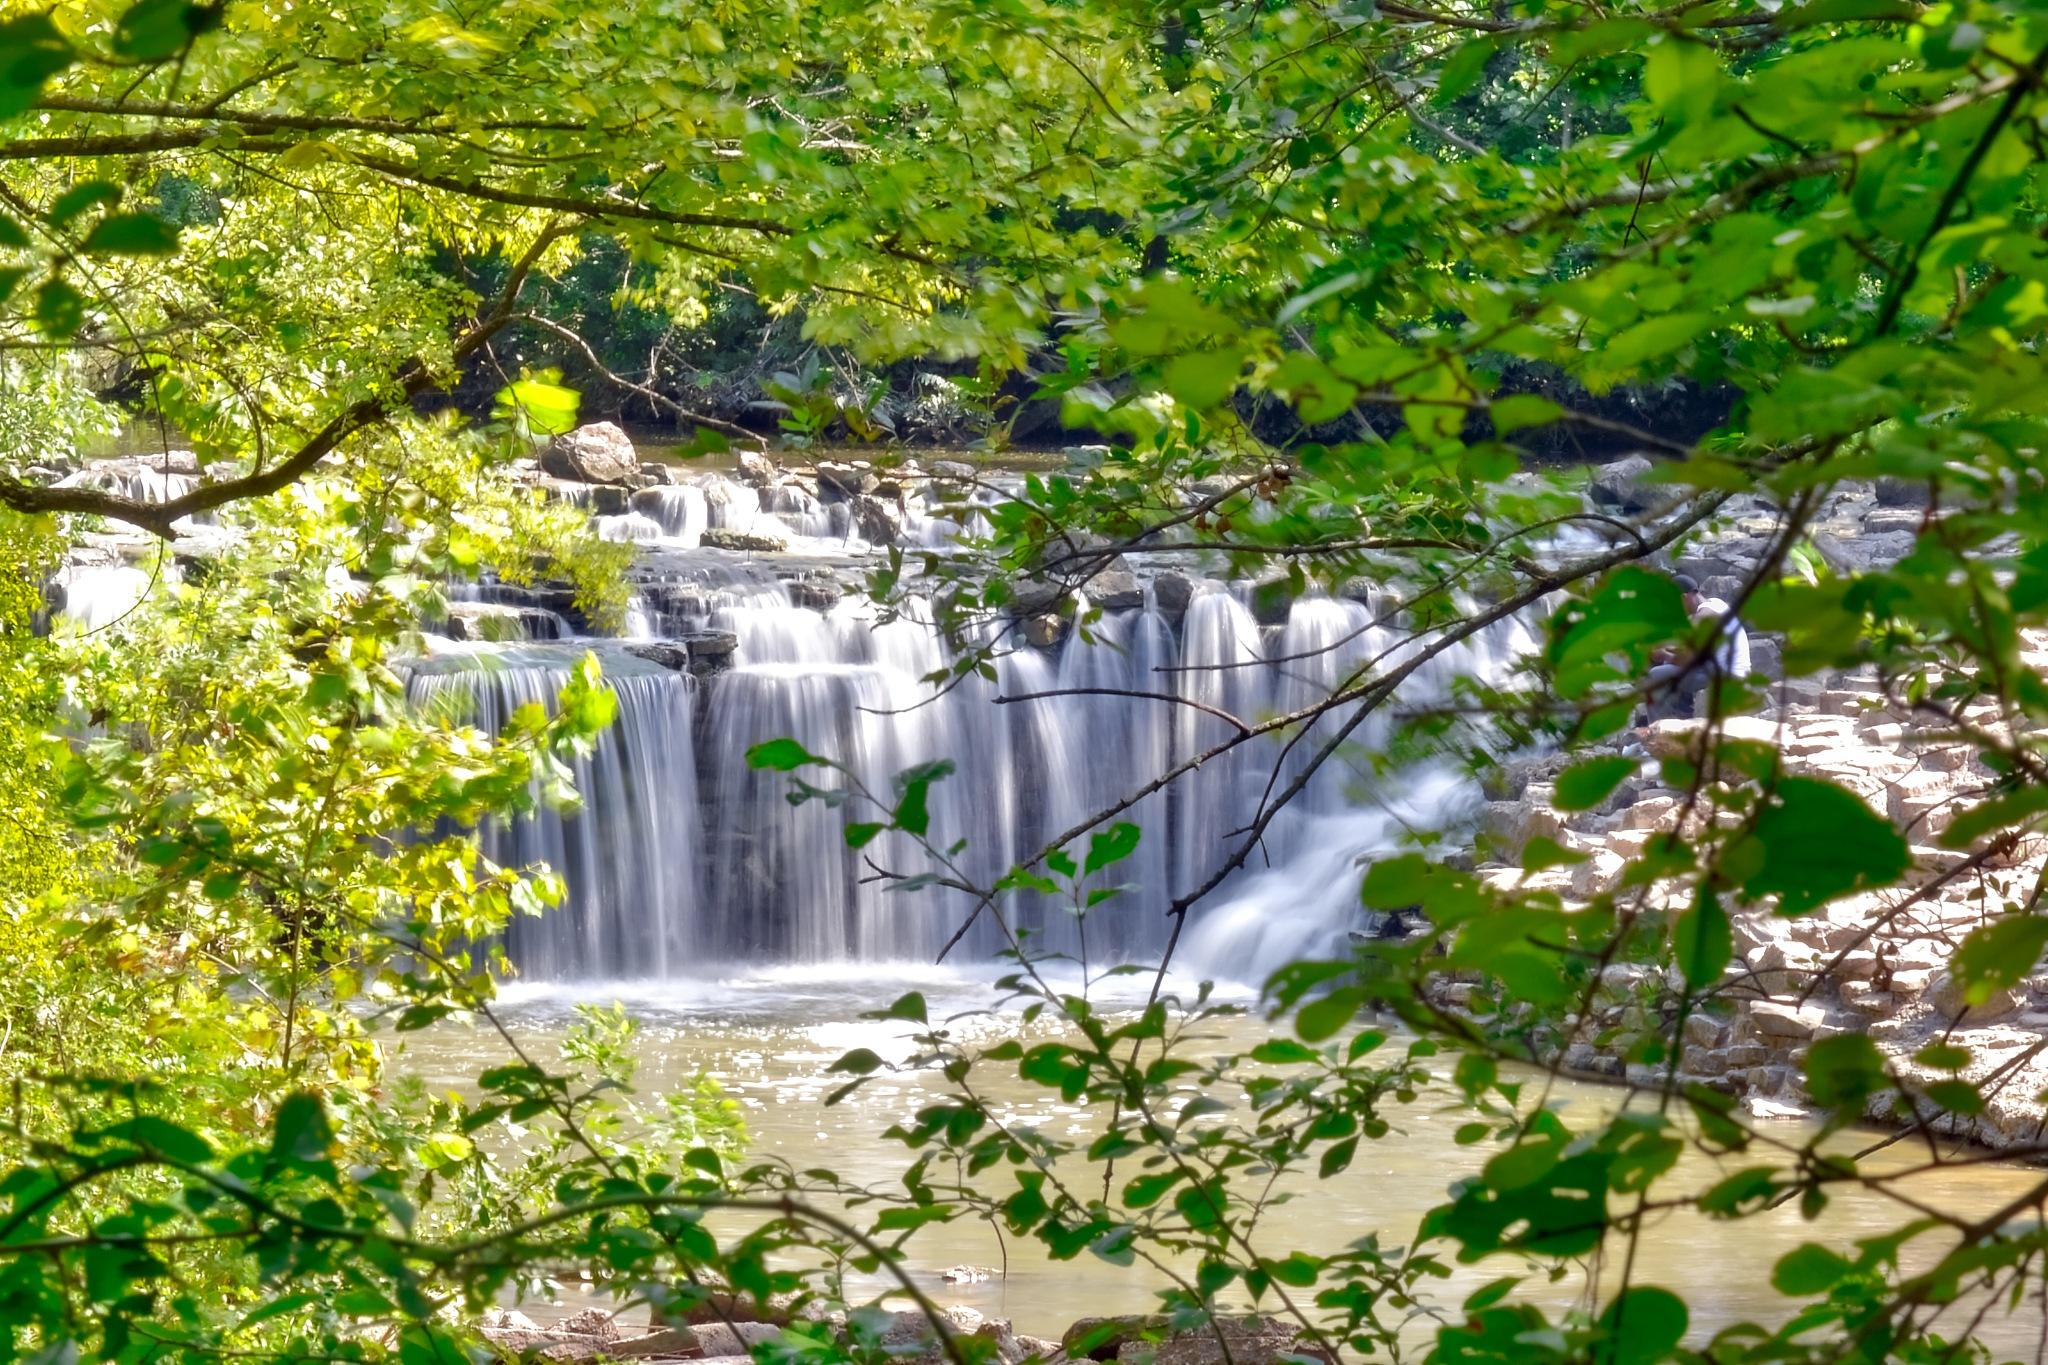 Hidden Waterfall by AdamKBuchanan